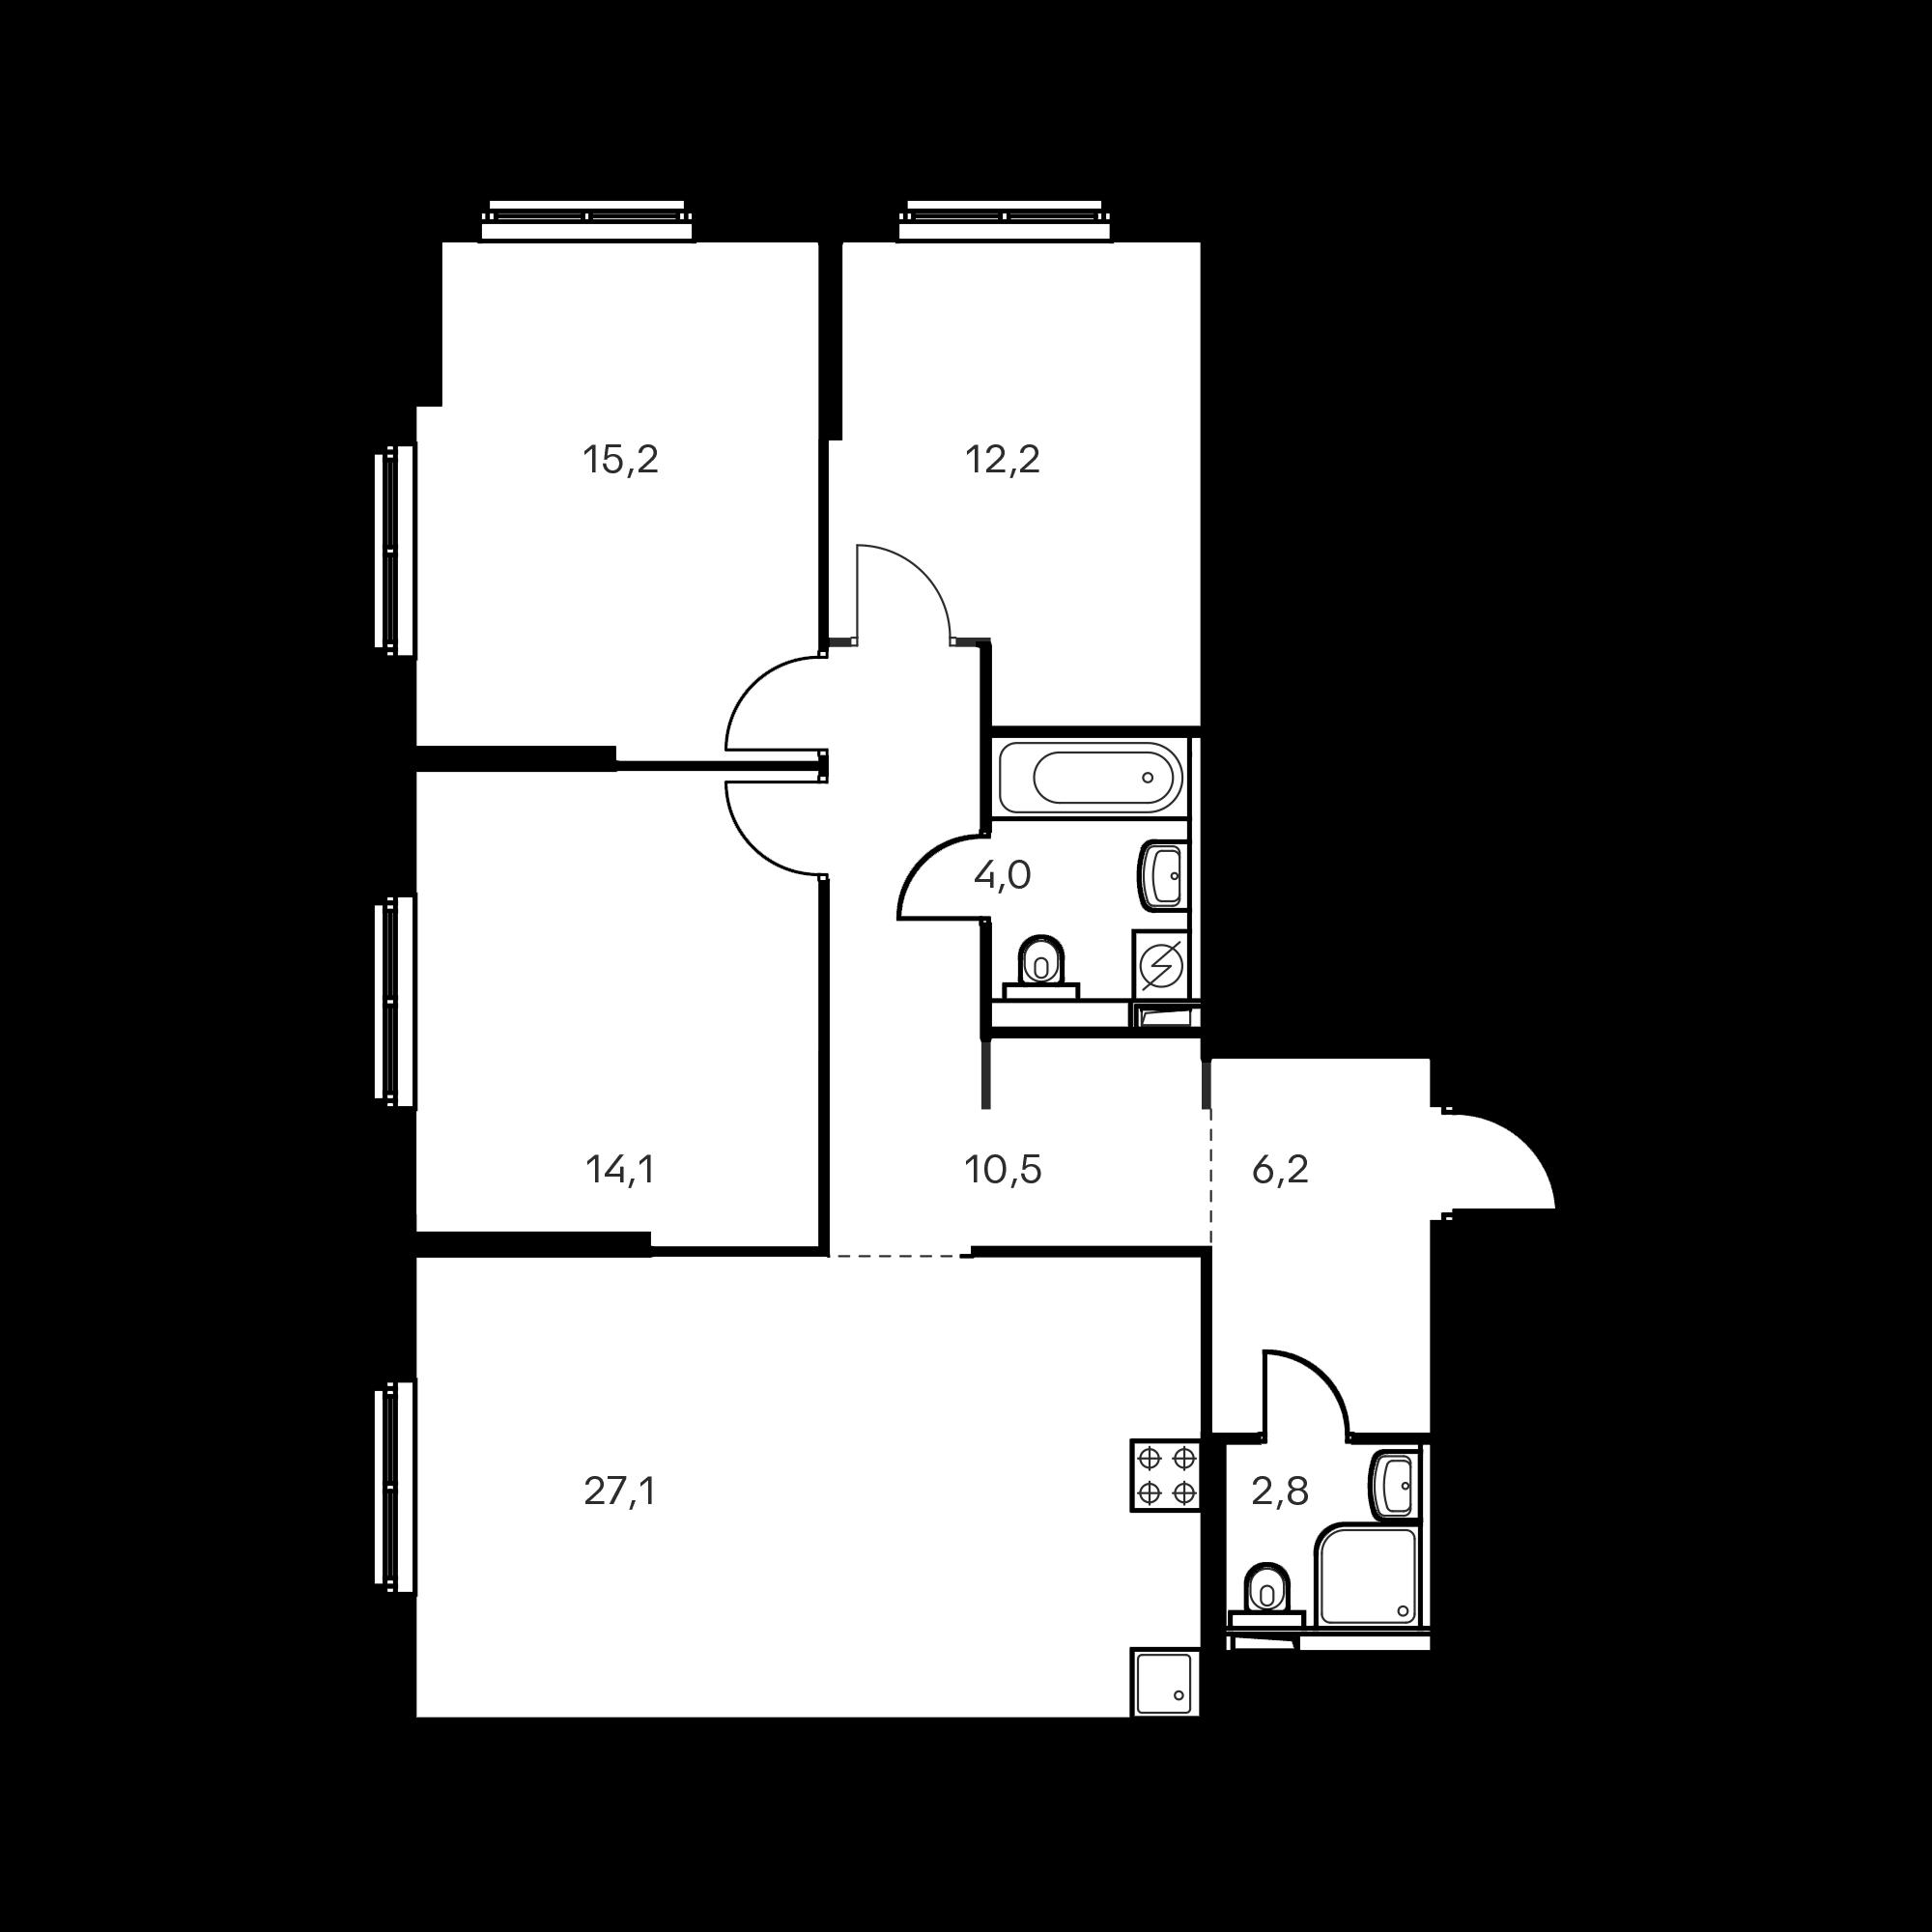 3EL1_13.1